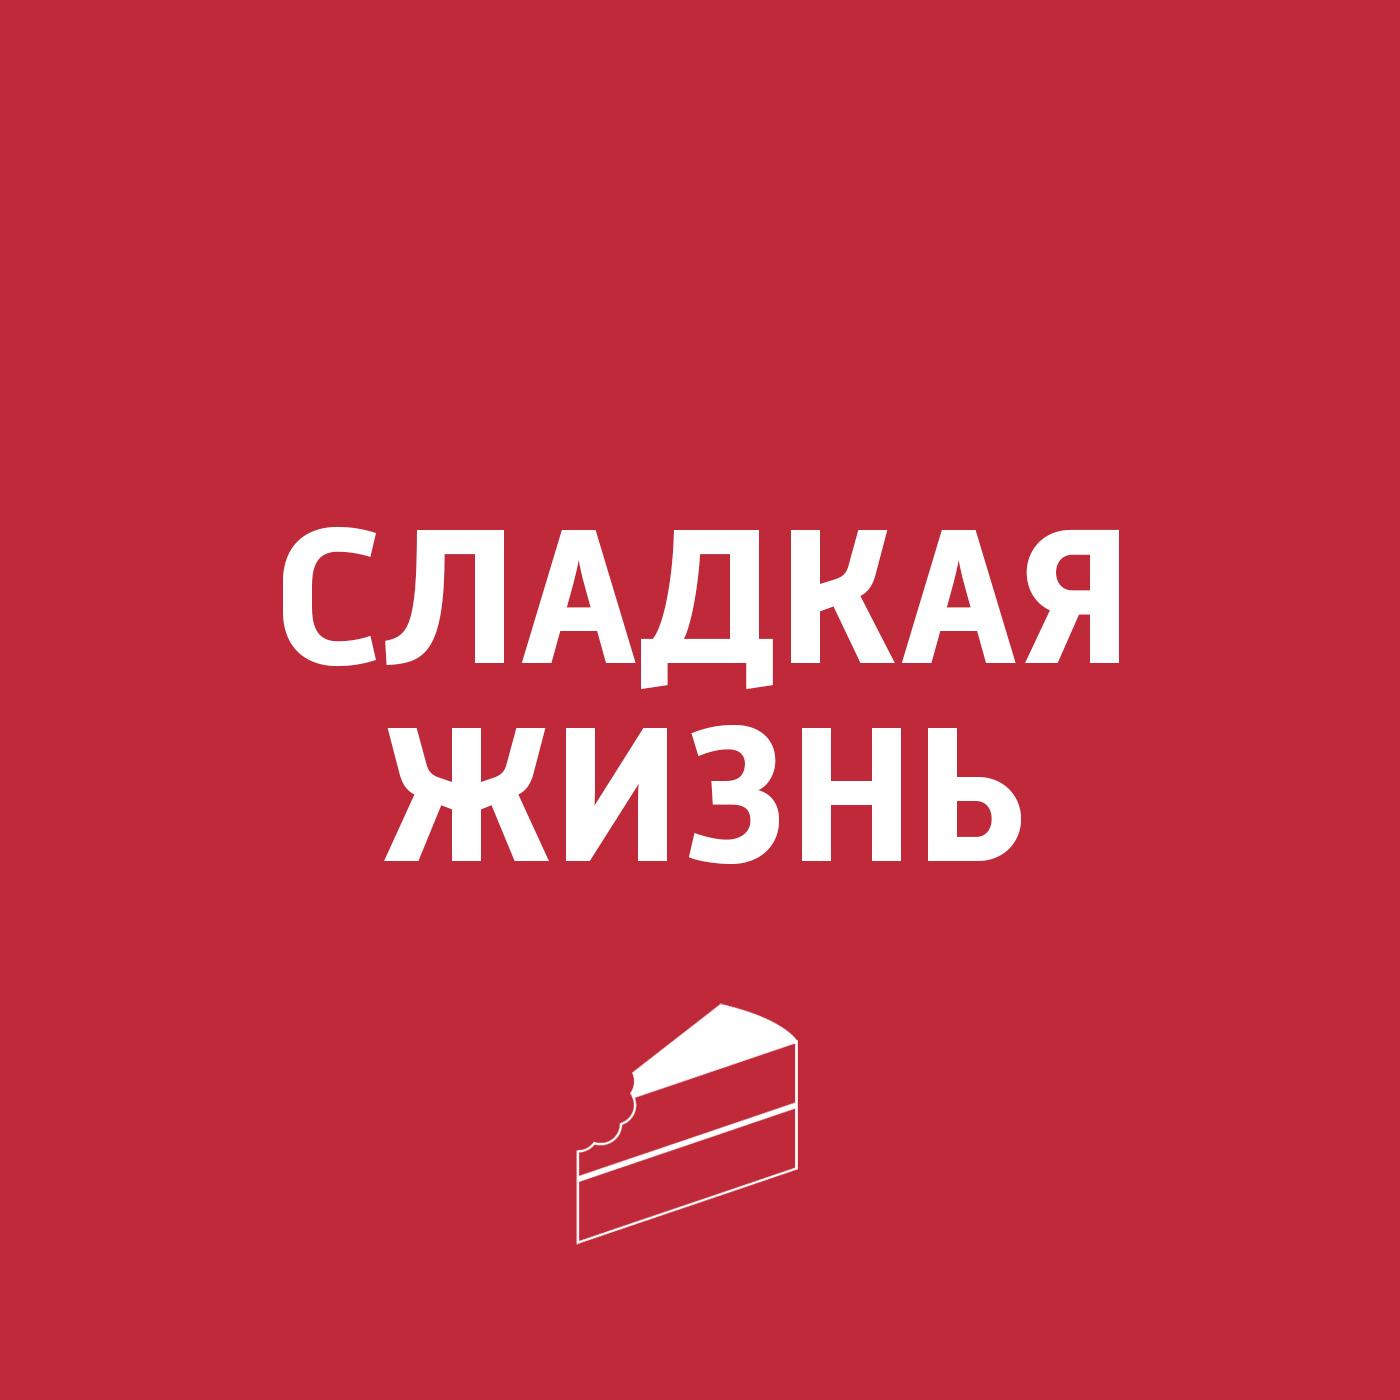 Картаев Павел Ириски картаев павел чуррос